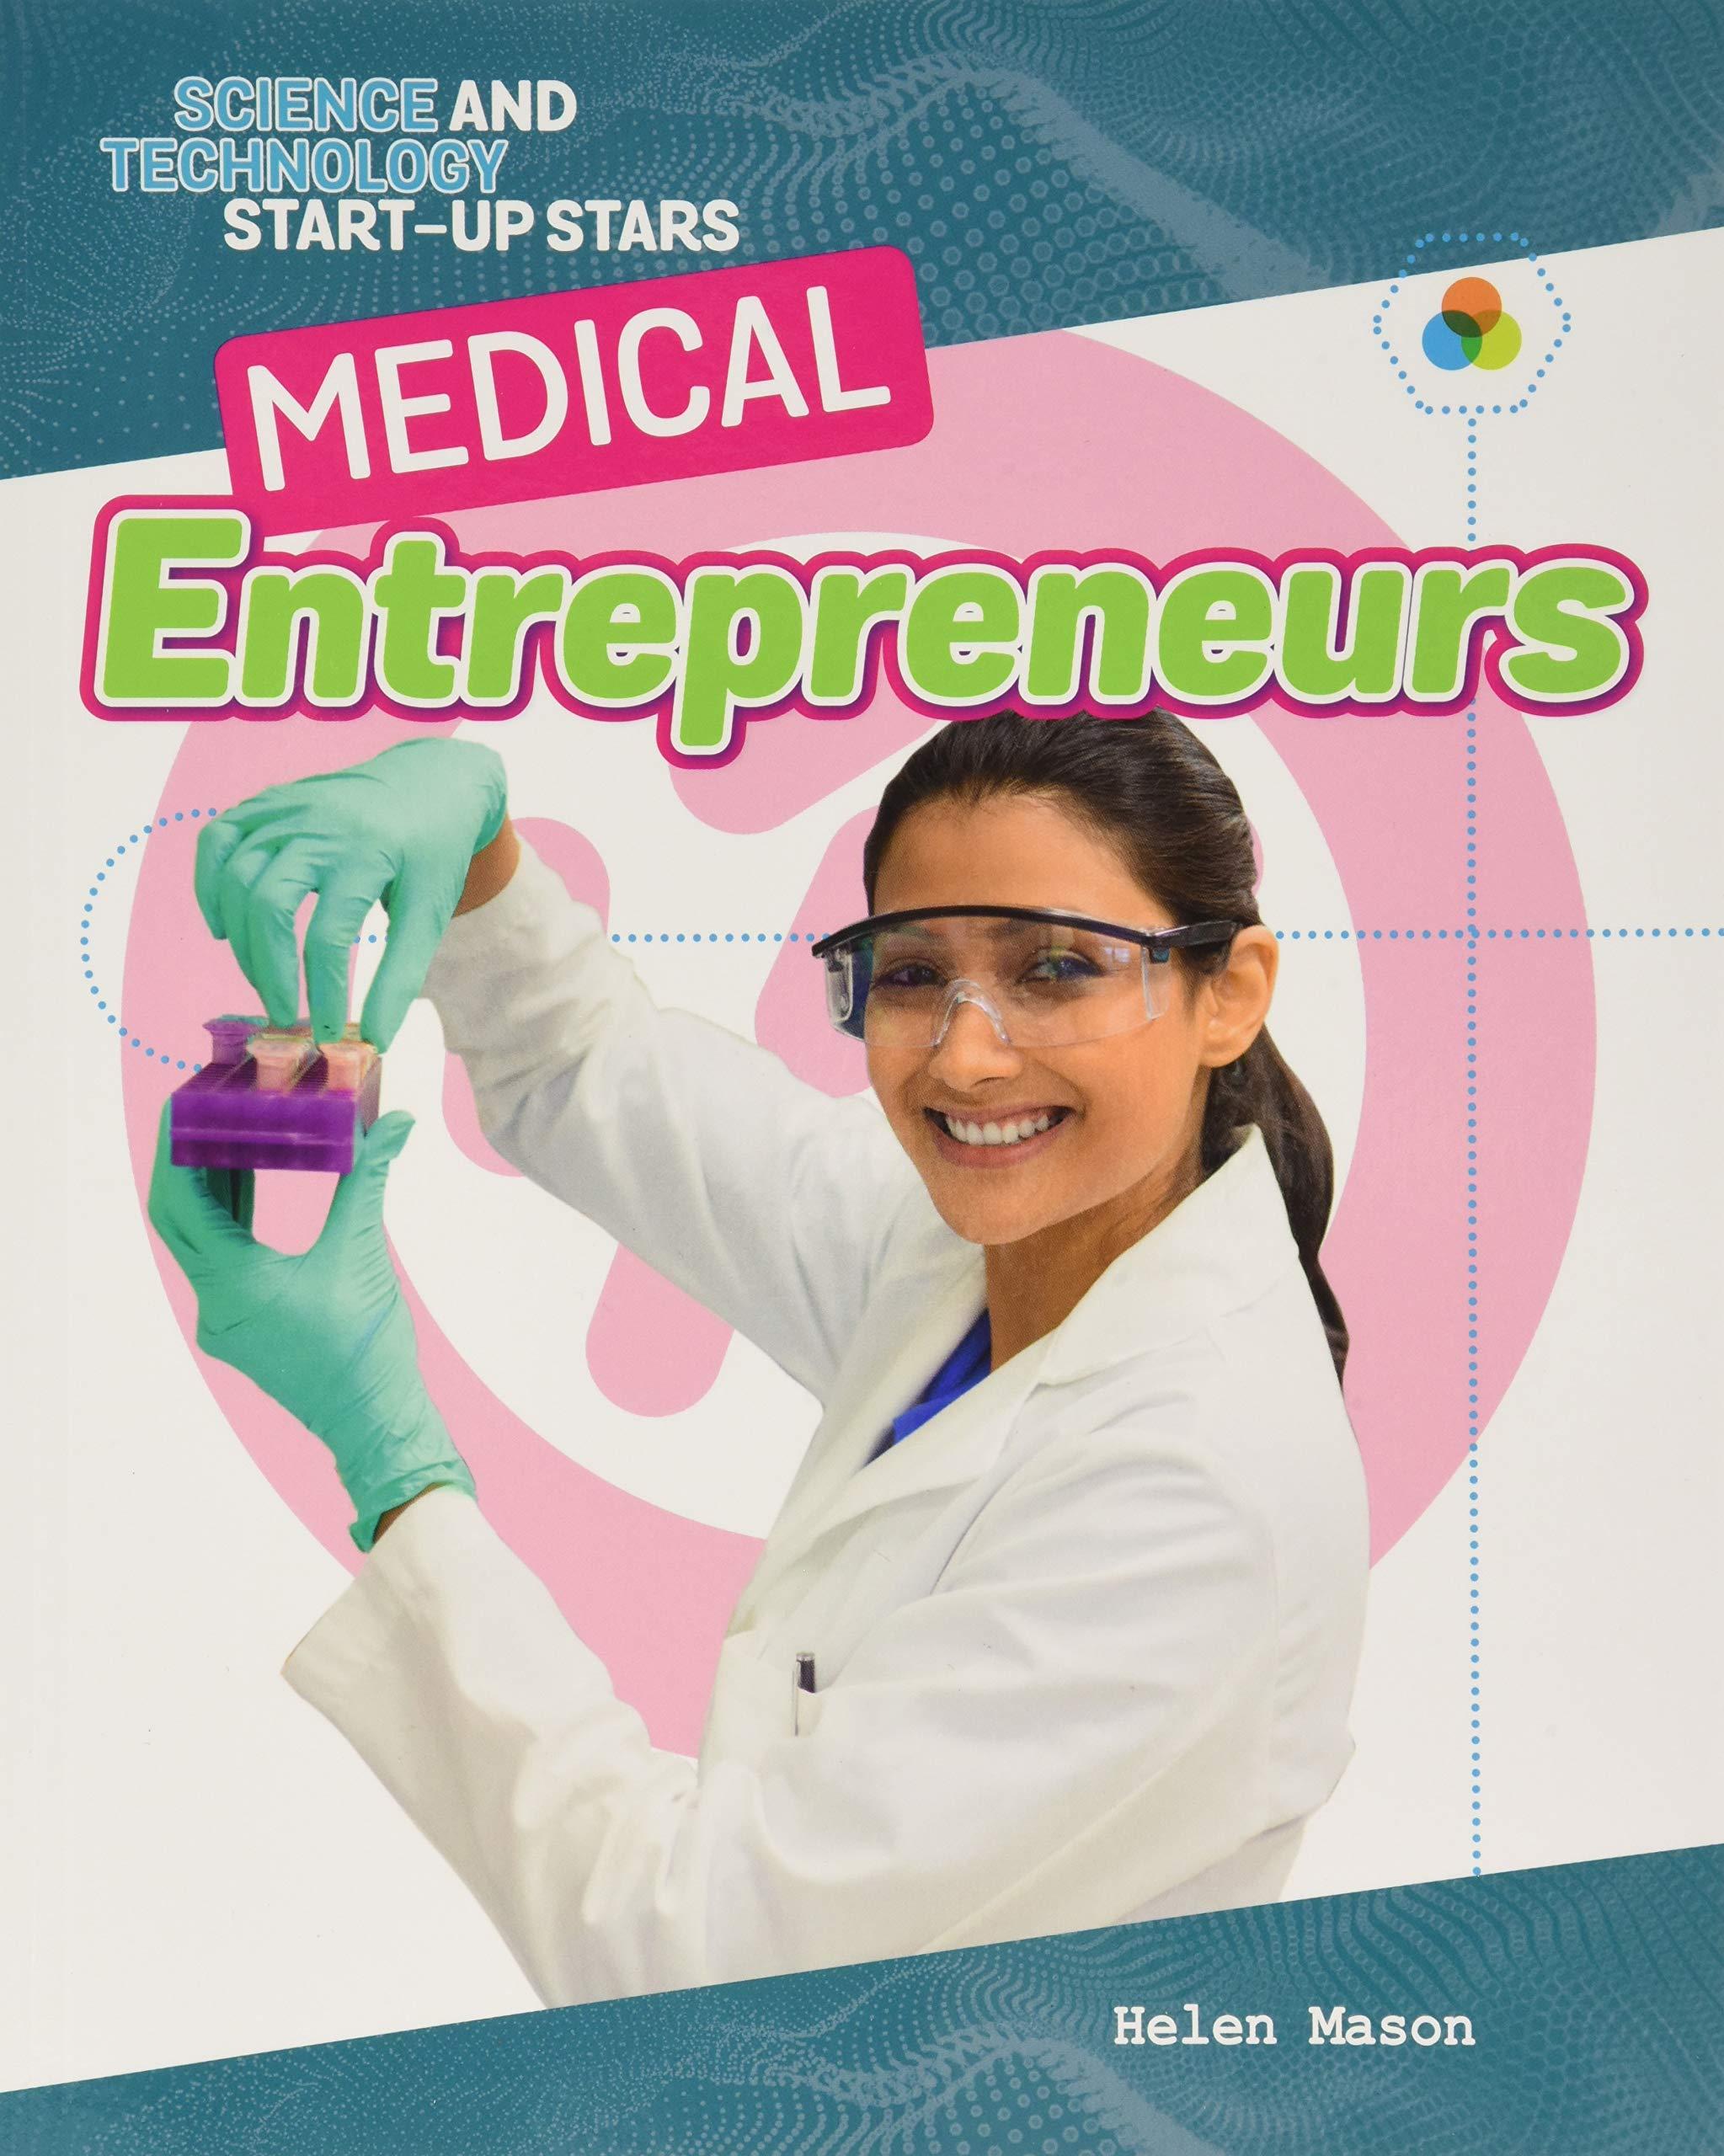 Download Medical Entrepreneurs (Science and Technology Start-Up Stars) pdf epub